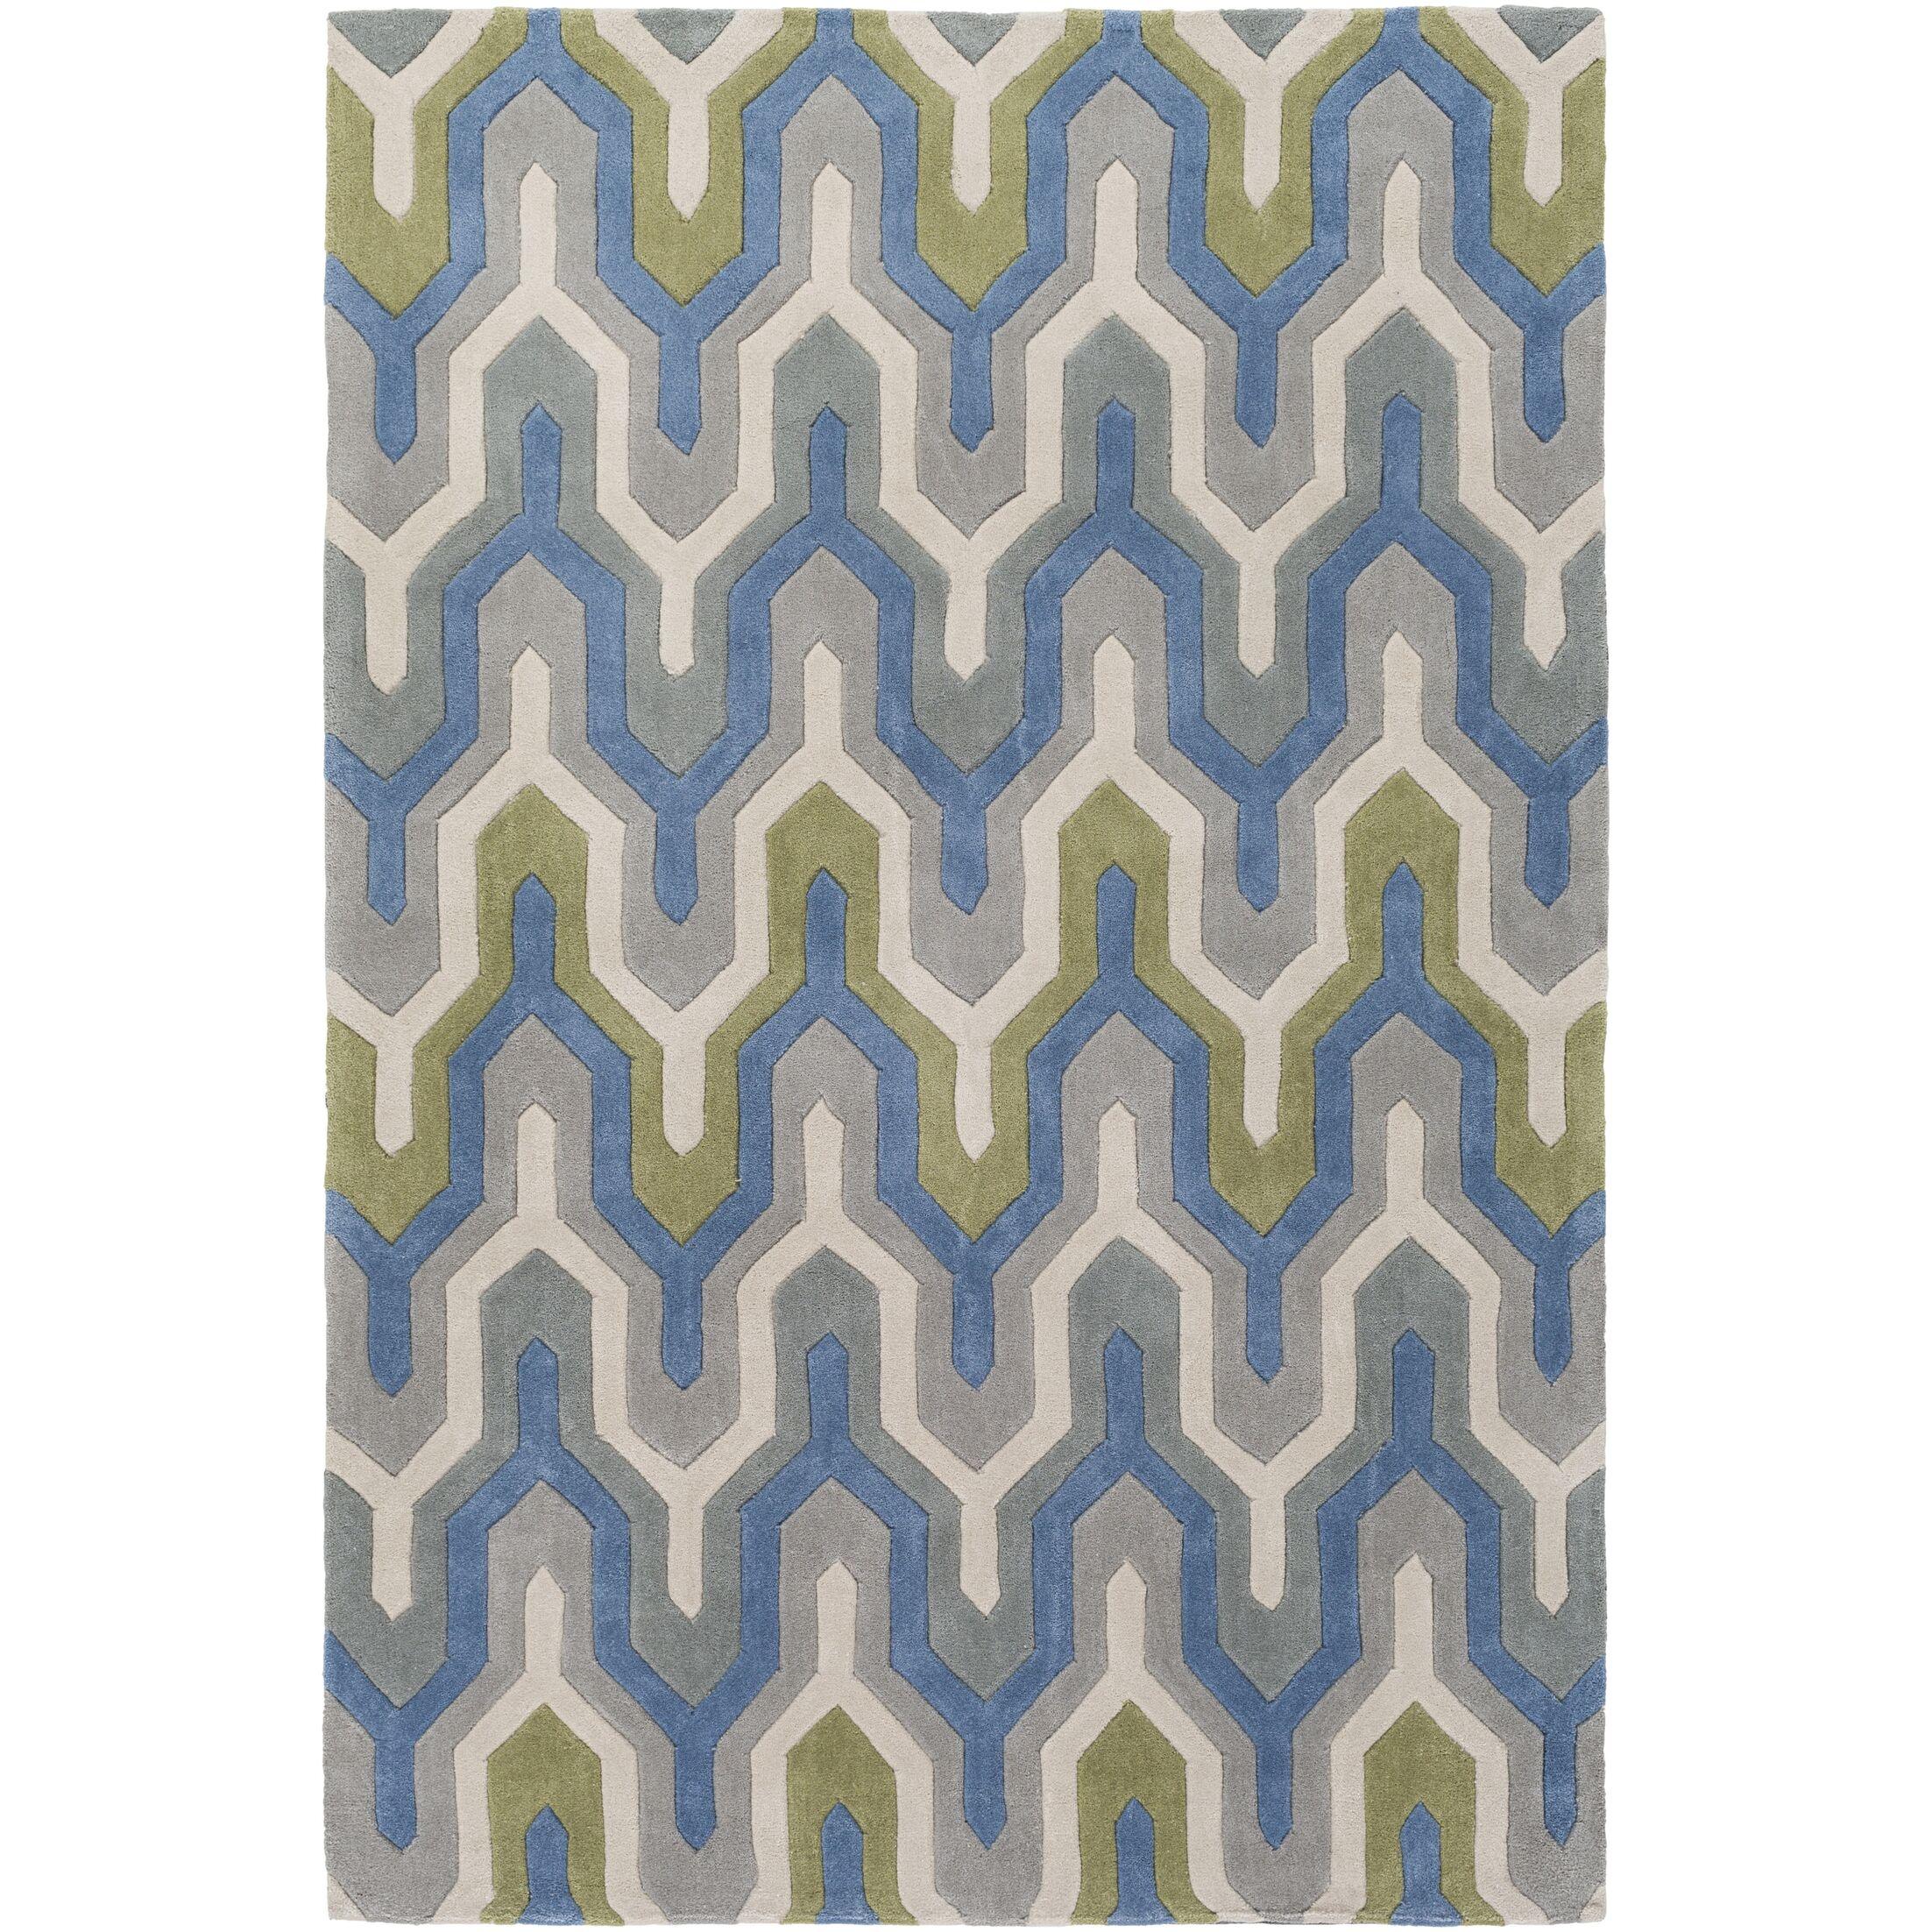 Conroy Hand-Tufted Area Rug Rug Size: Rectangle 8' x 11'